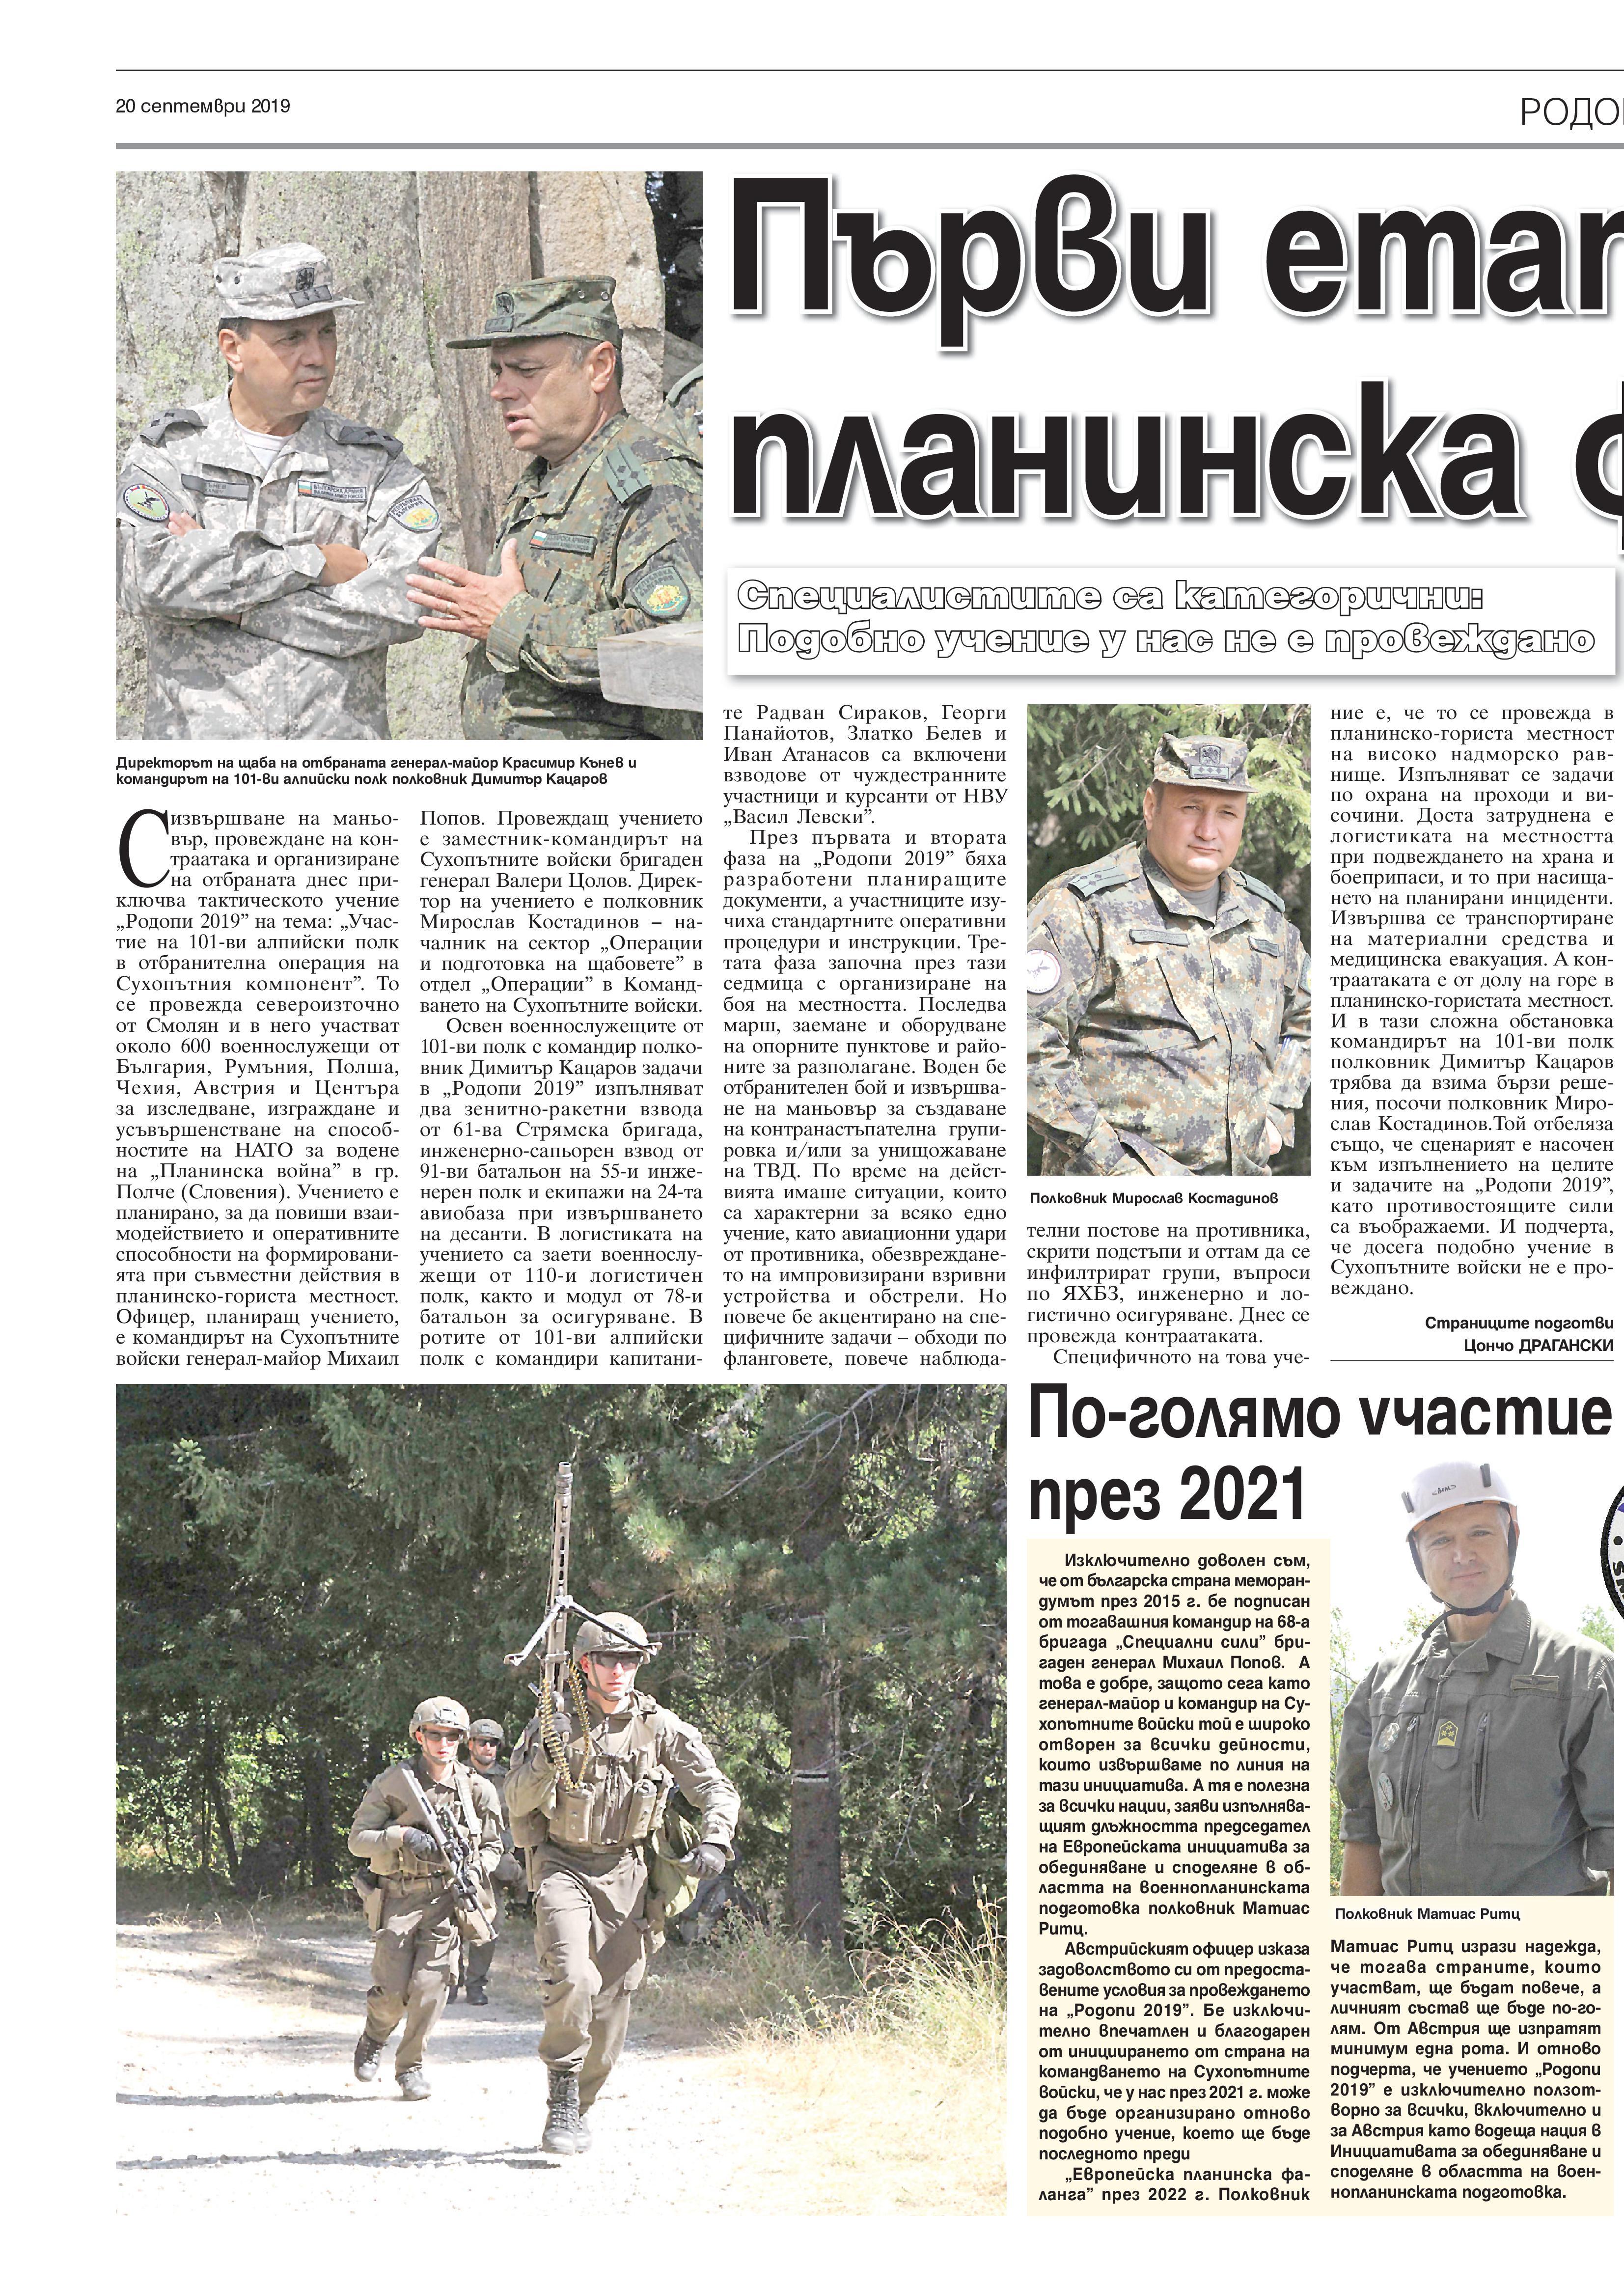 https://www.armymedia.bg/wp-content/uploads/2015/06/16-32.jpg